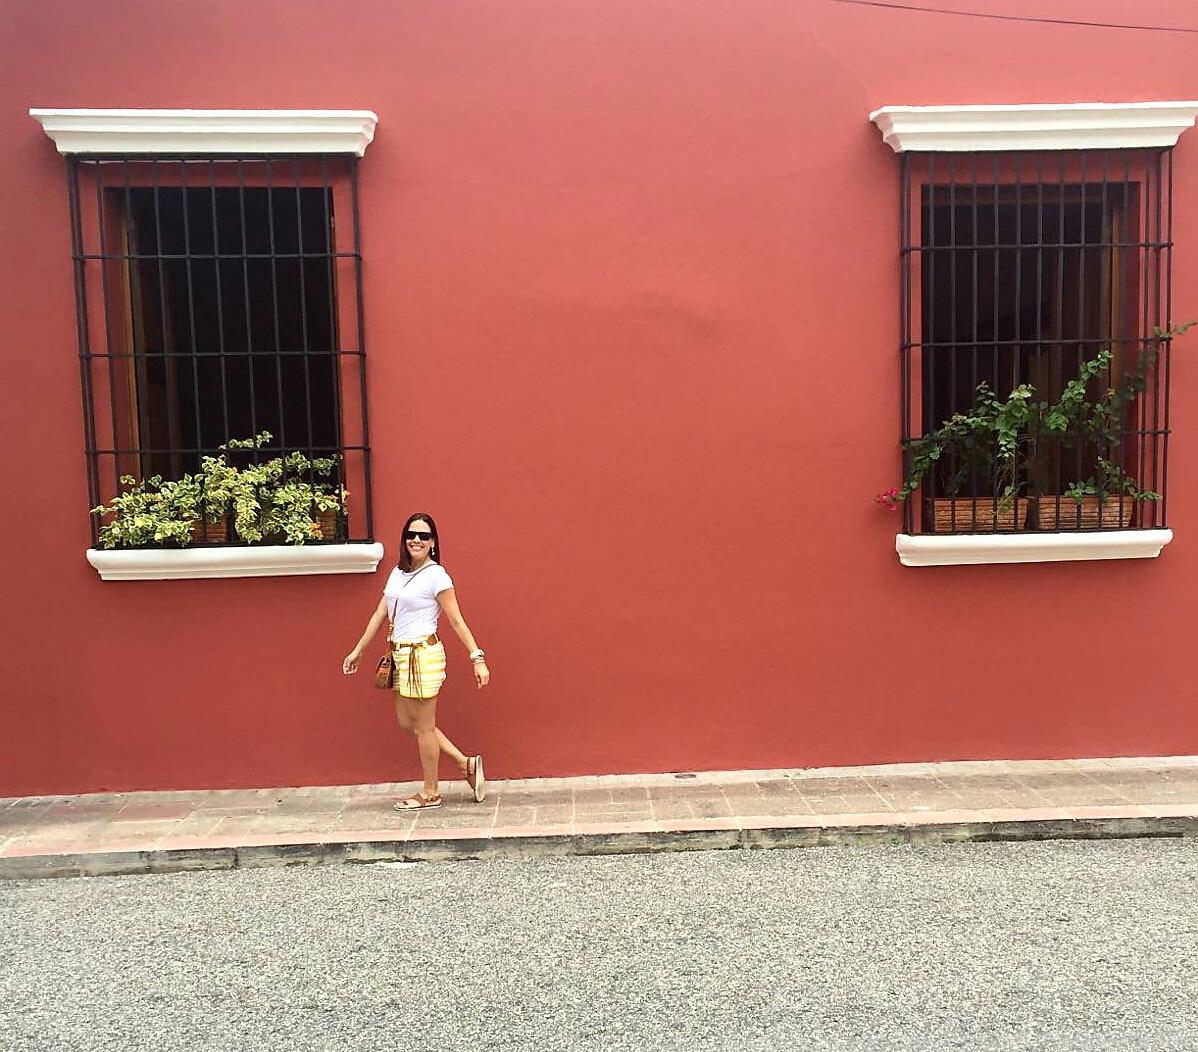 zona-colonial-republica-dominicana-9